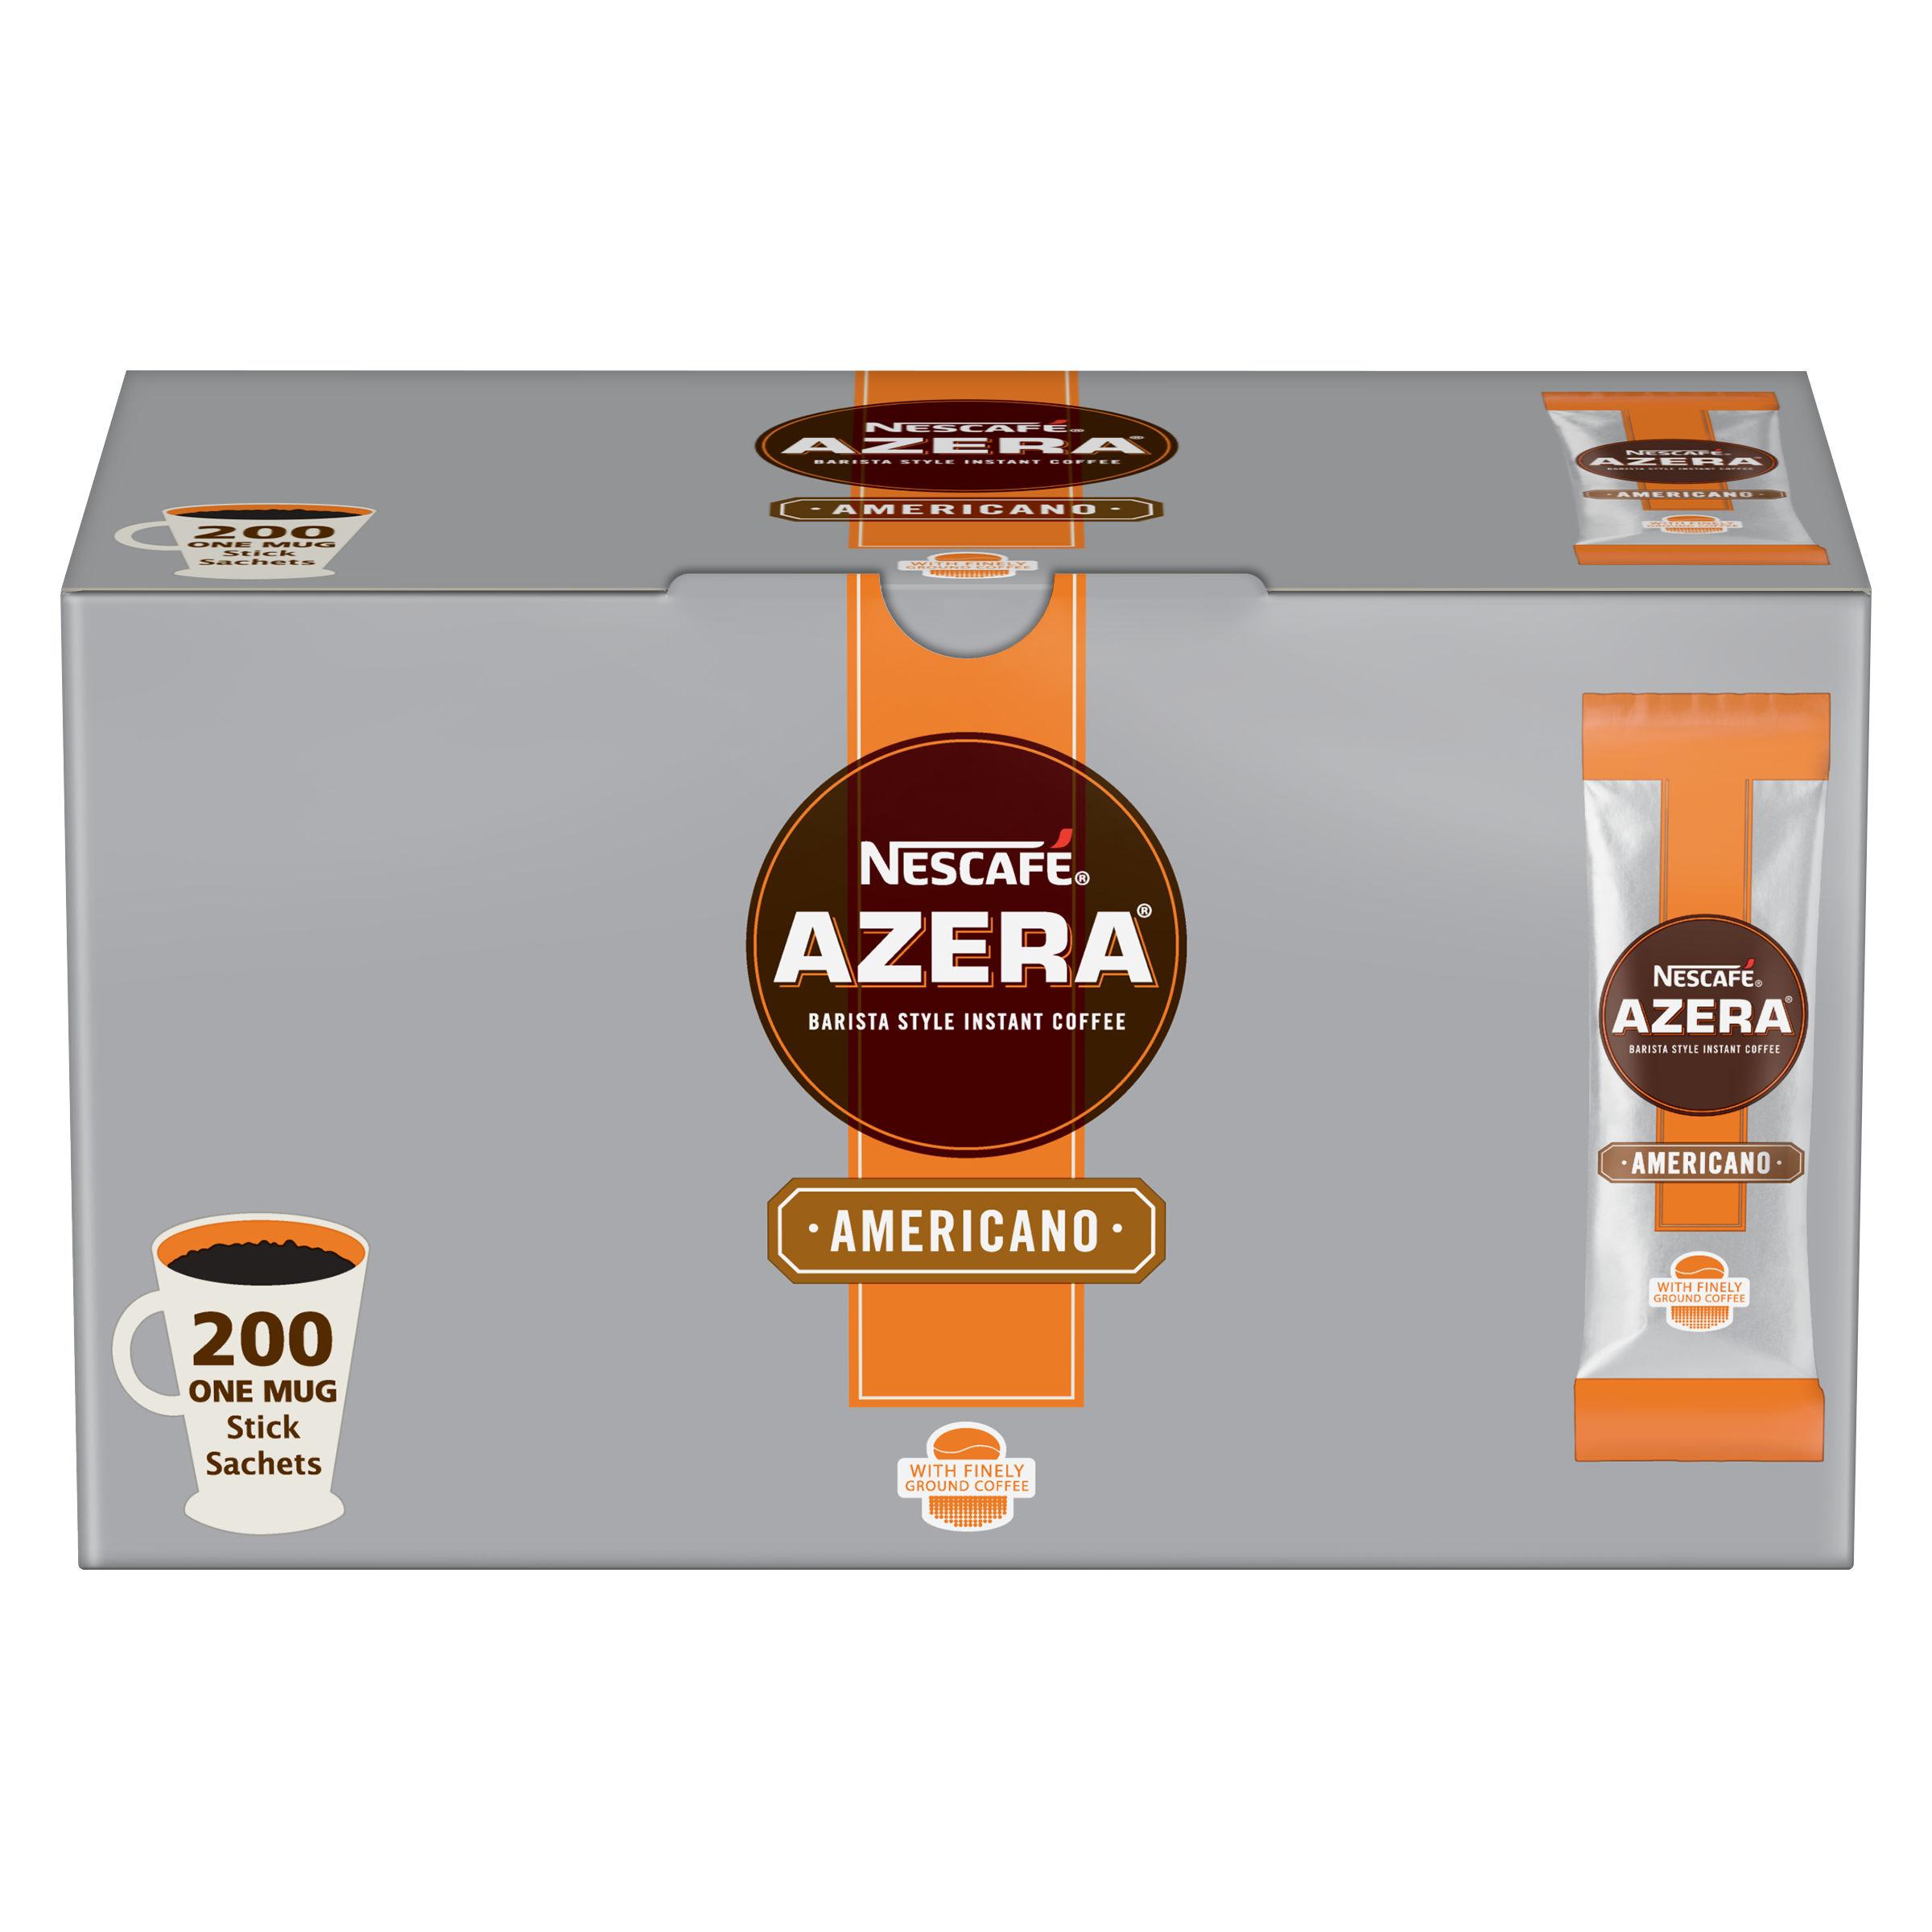 Coffee Nescafe Azera Americano Coffee Sticks 2g (Pack 200)